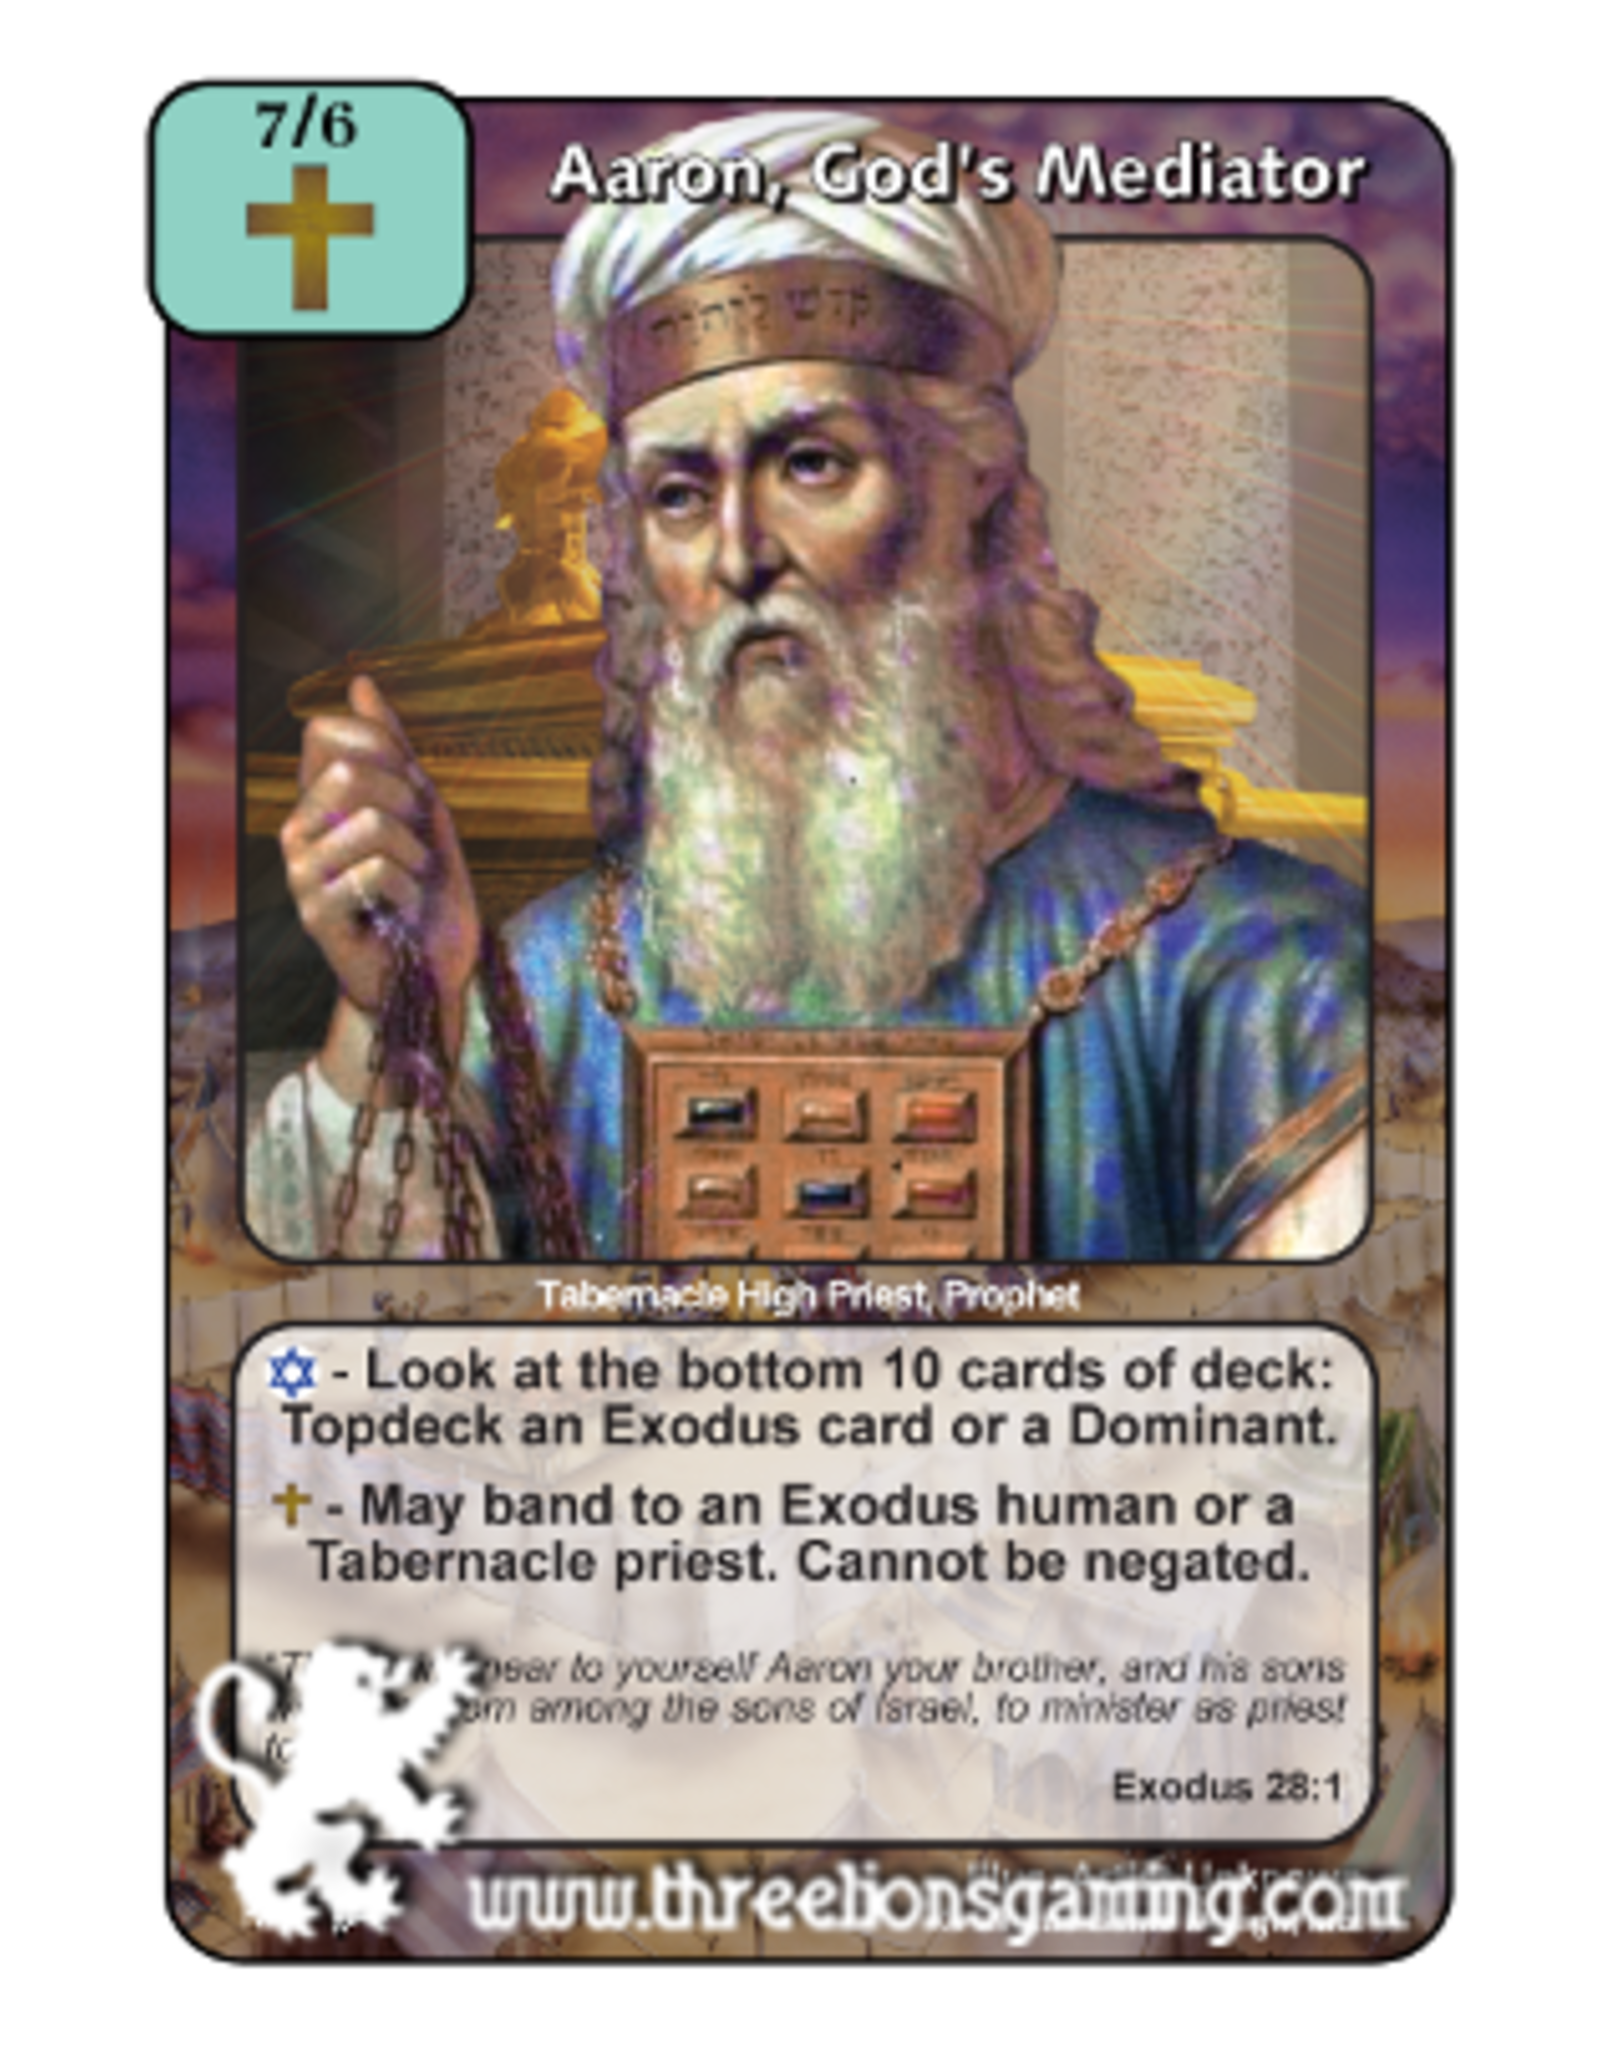 PoC: Aaron, God's Mediator